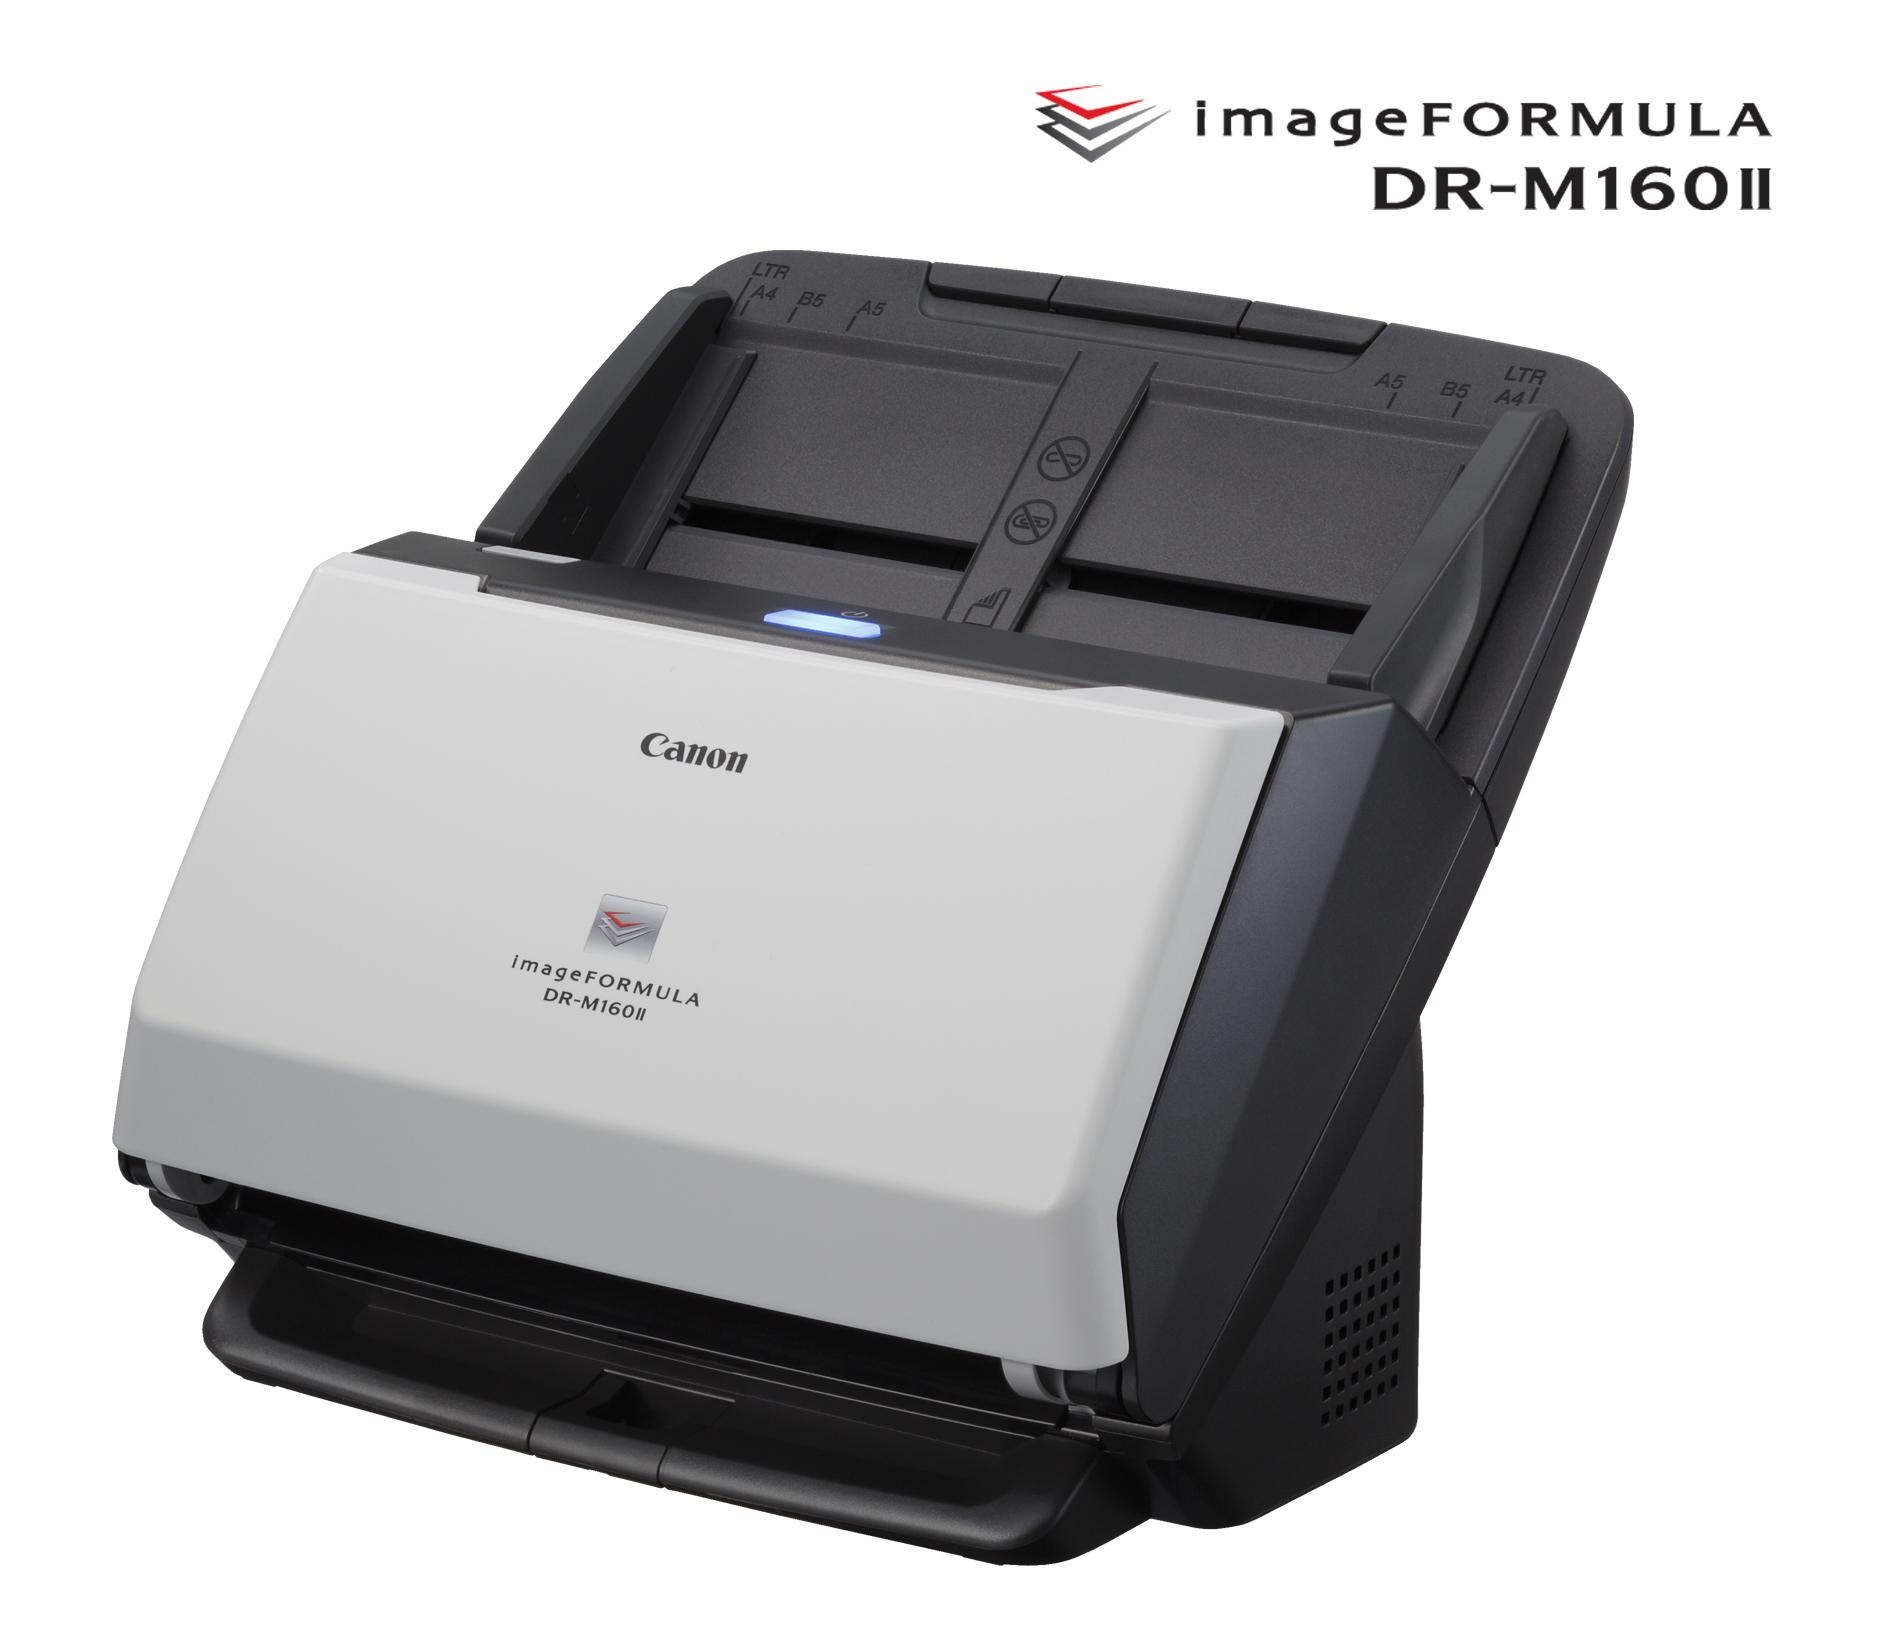 Amazon.com: Canon DR-M160II Document Scanner: Electronics